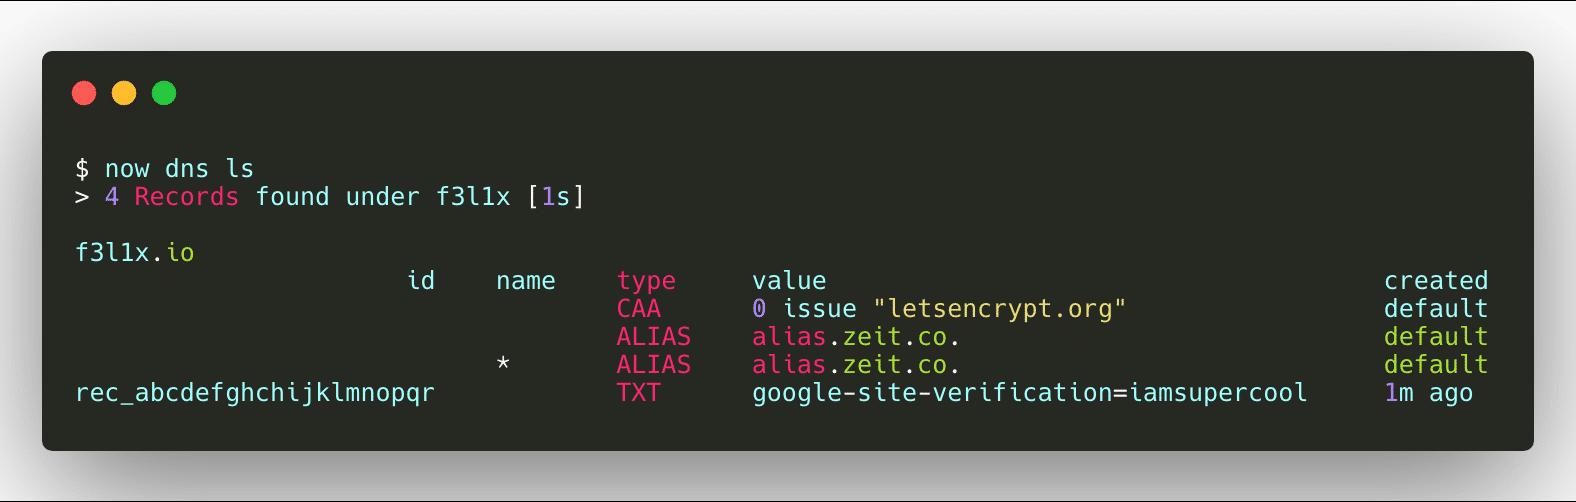 ZEIT DNS - List DNS records